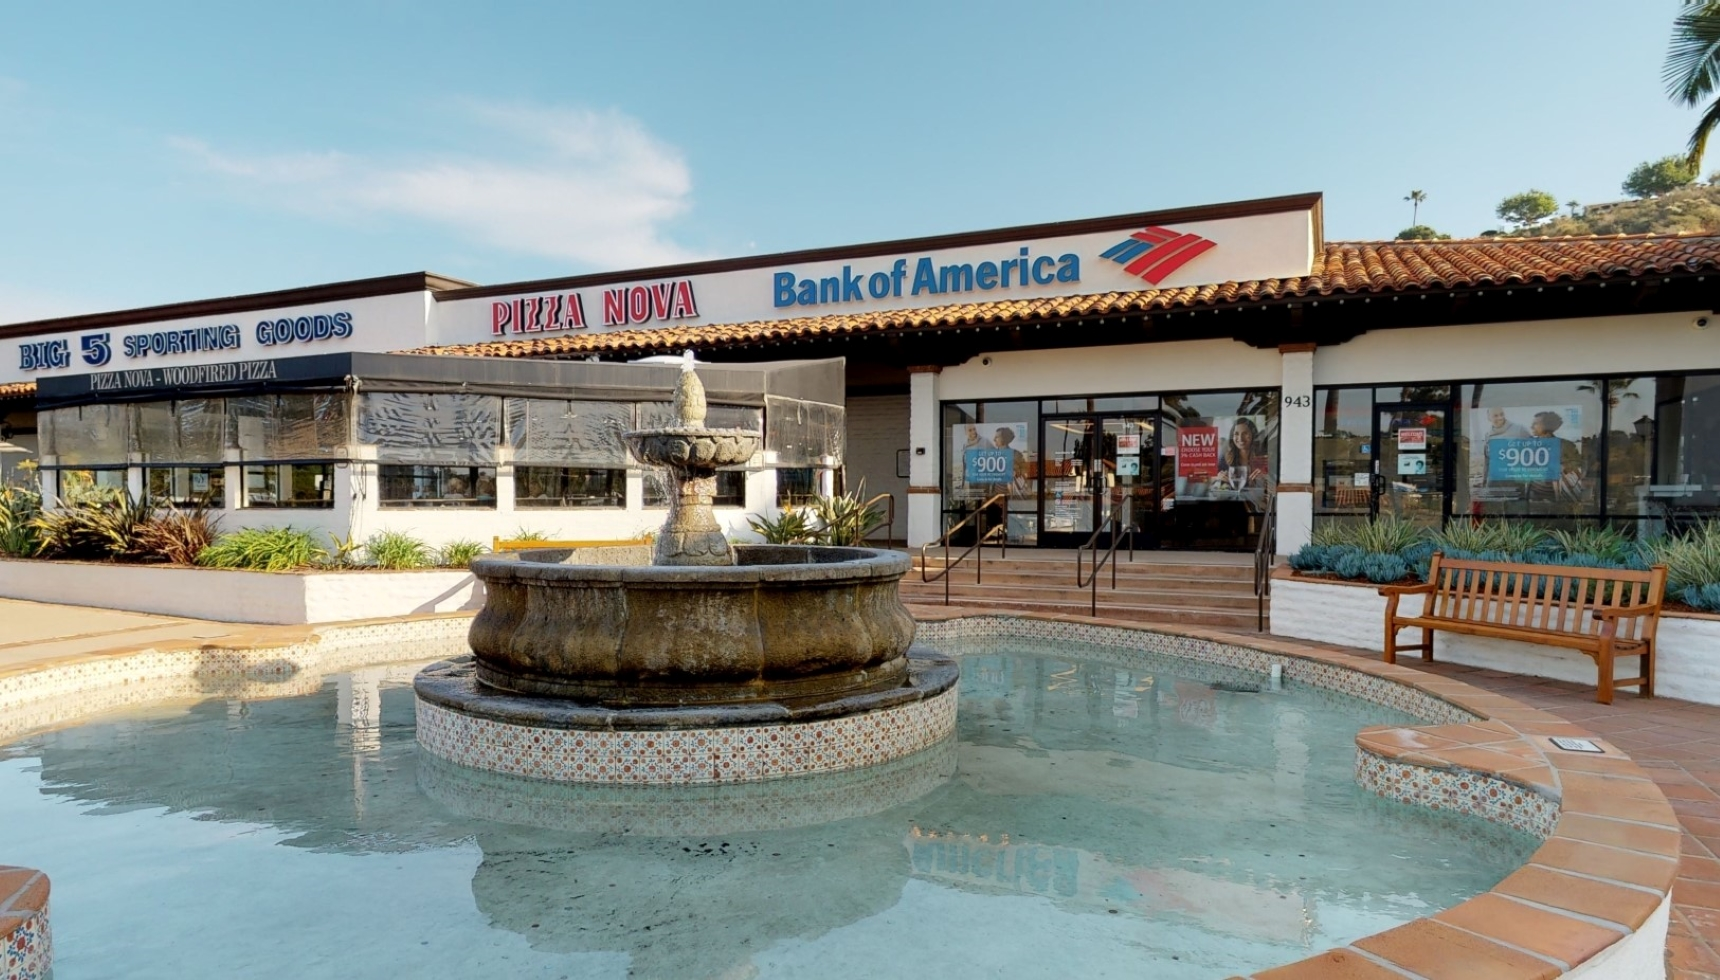 Bank of America financial center with walk-up ATM | 943 Lomas Santa Fe Dr, Solana Beach, CA 92075